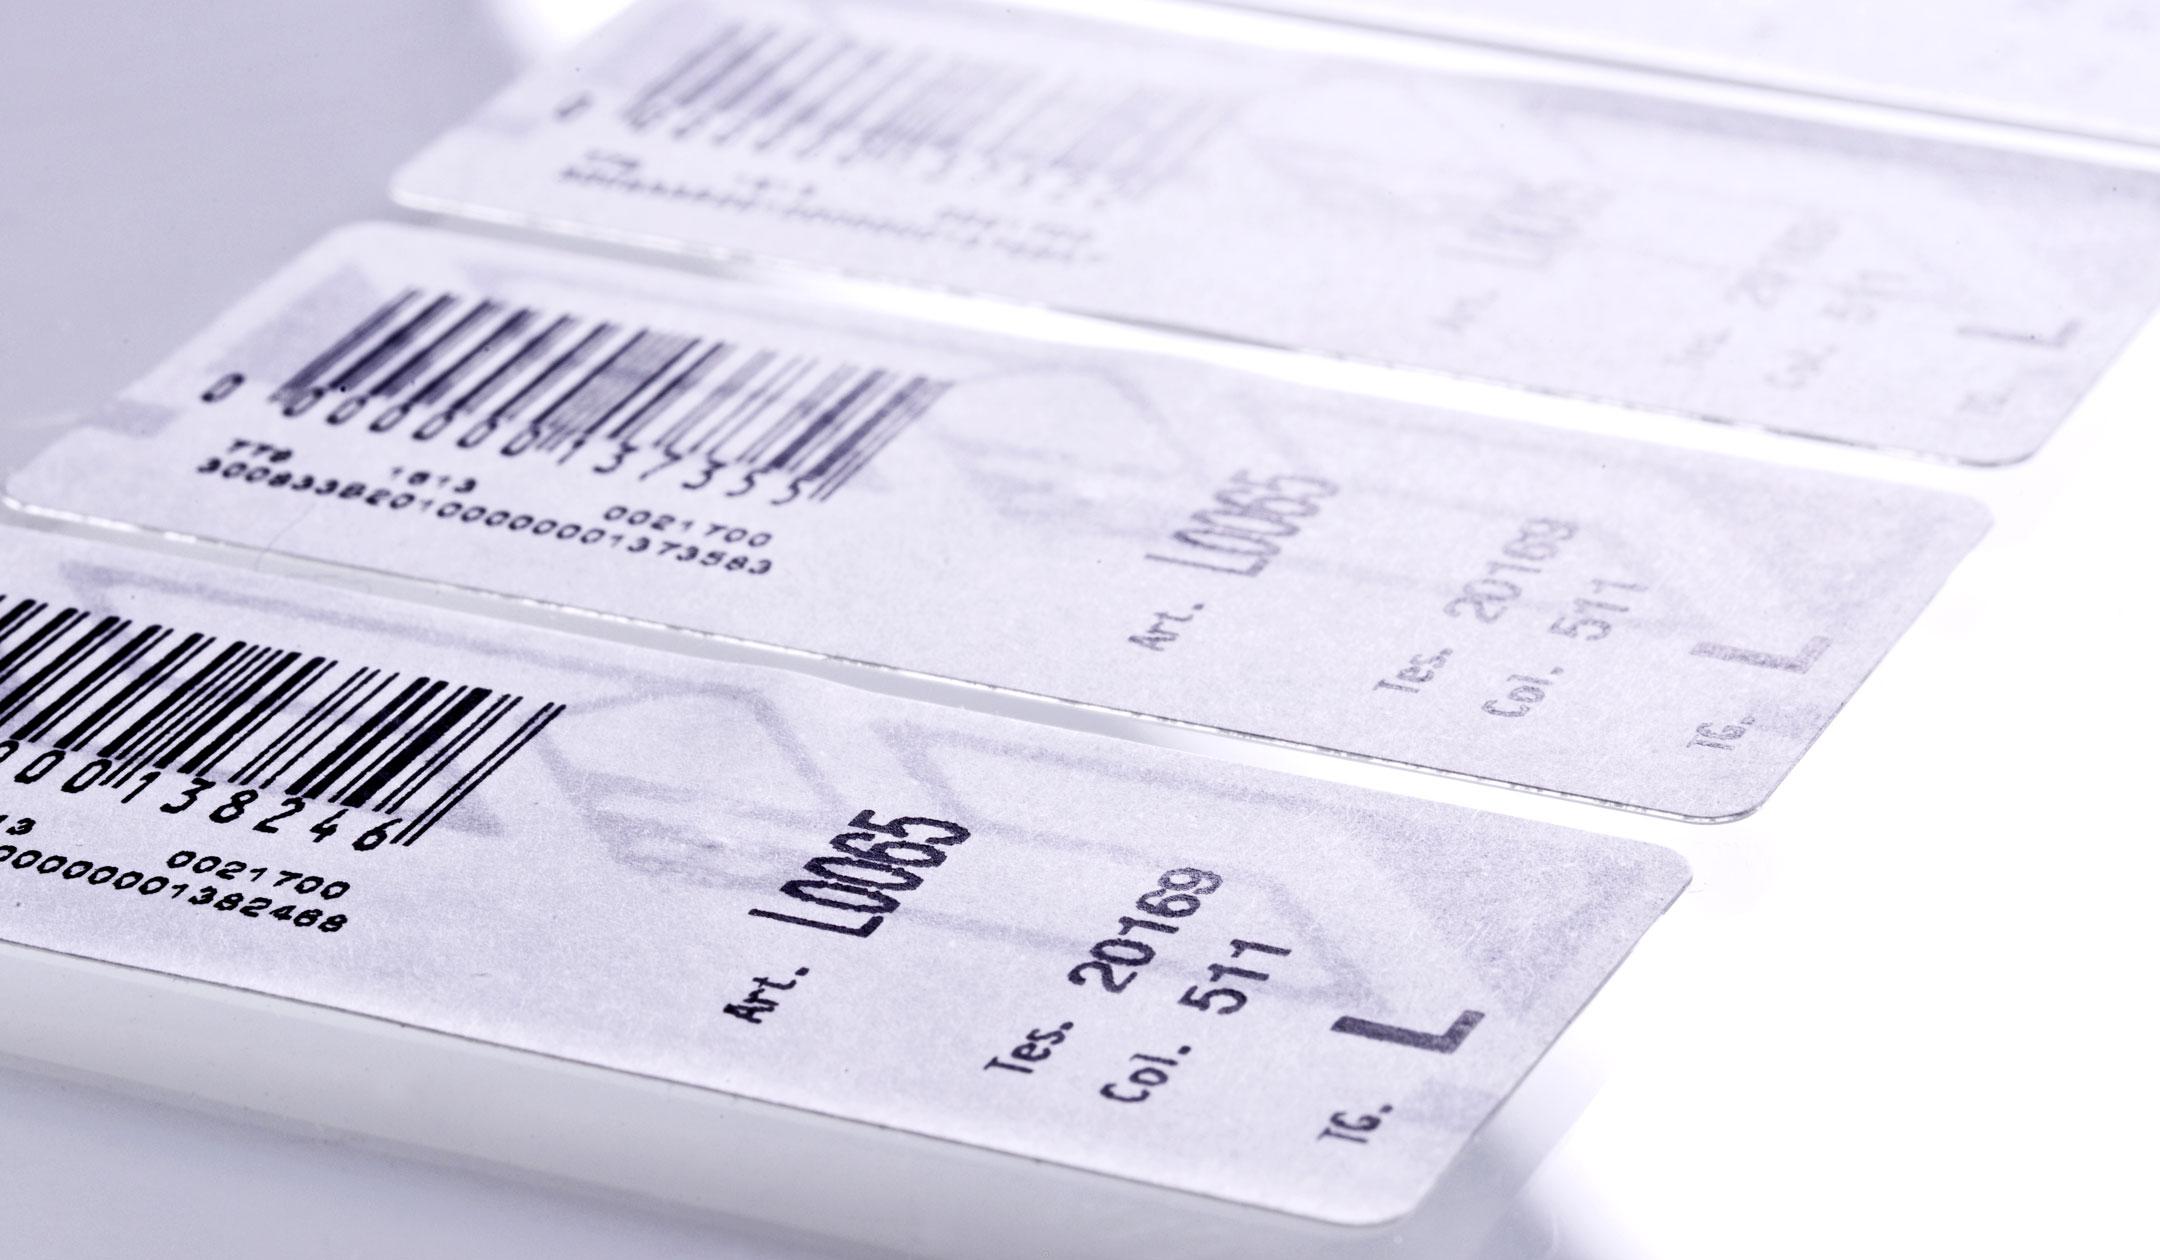 cadica_barcode